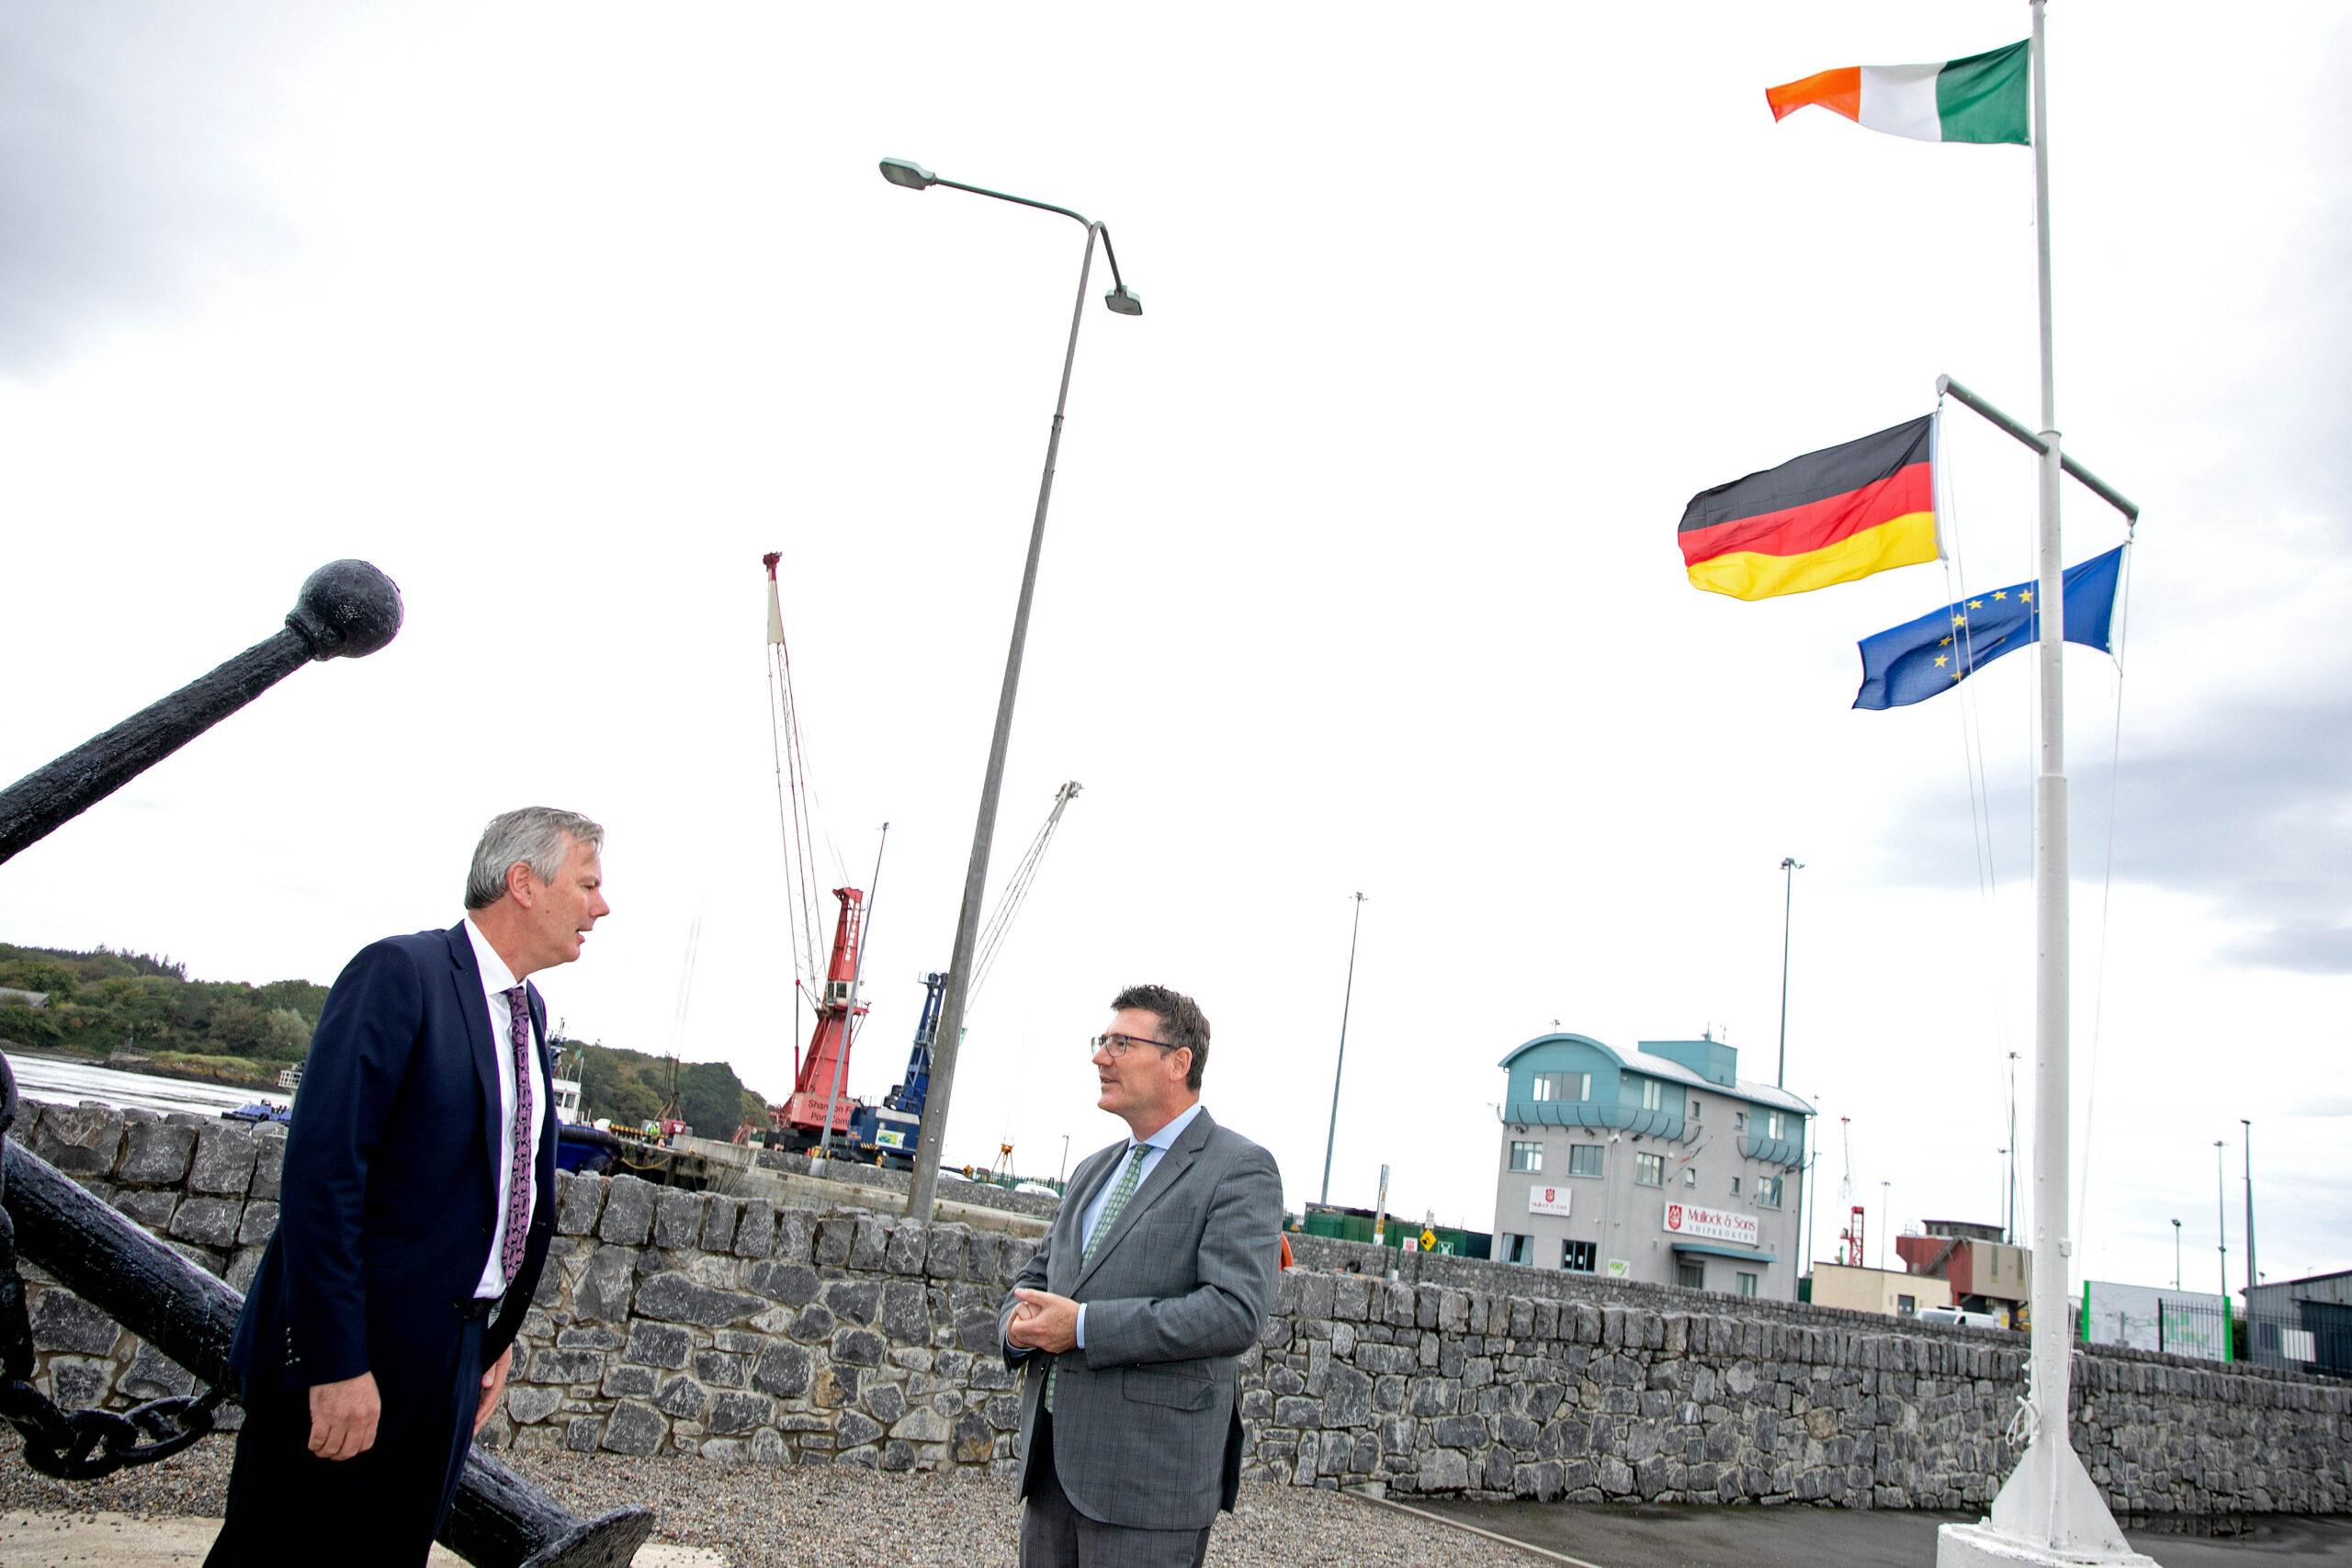 German Commissioner visits Shannon Foynes Port Company